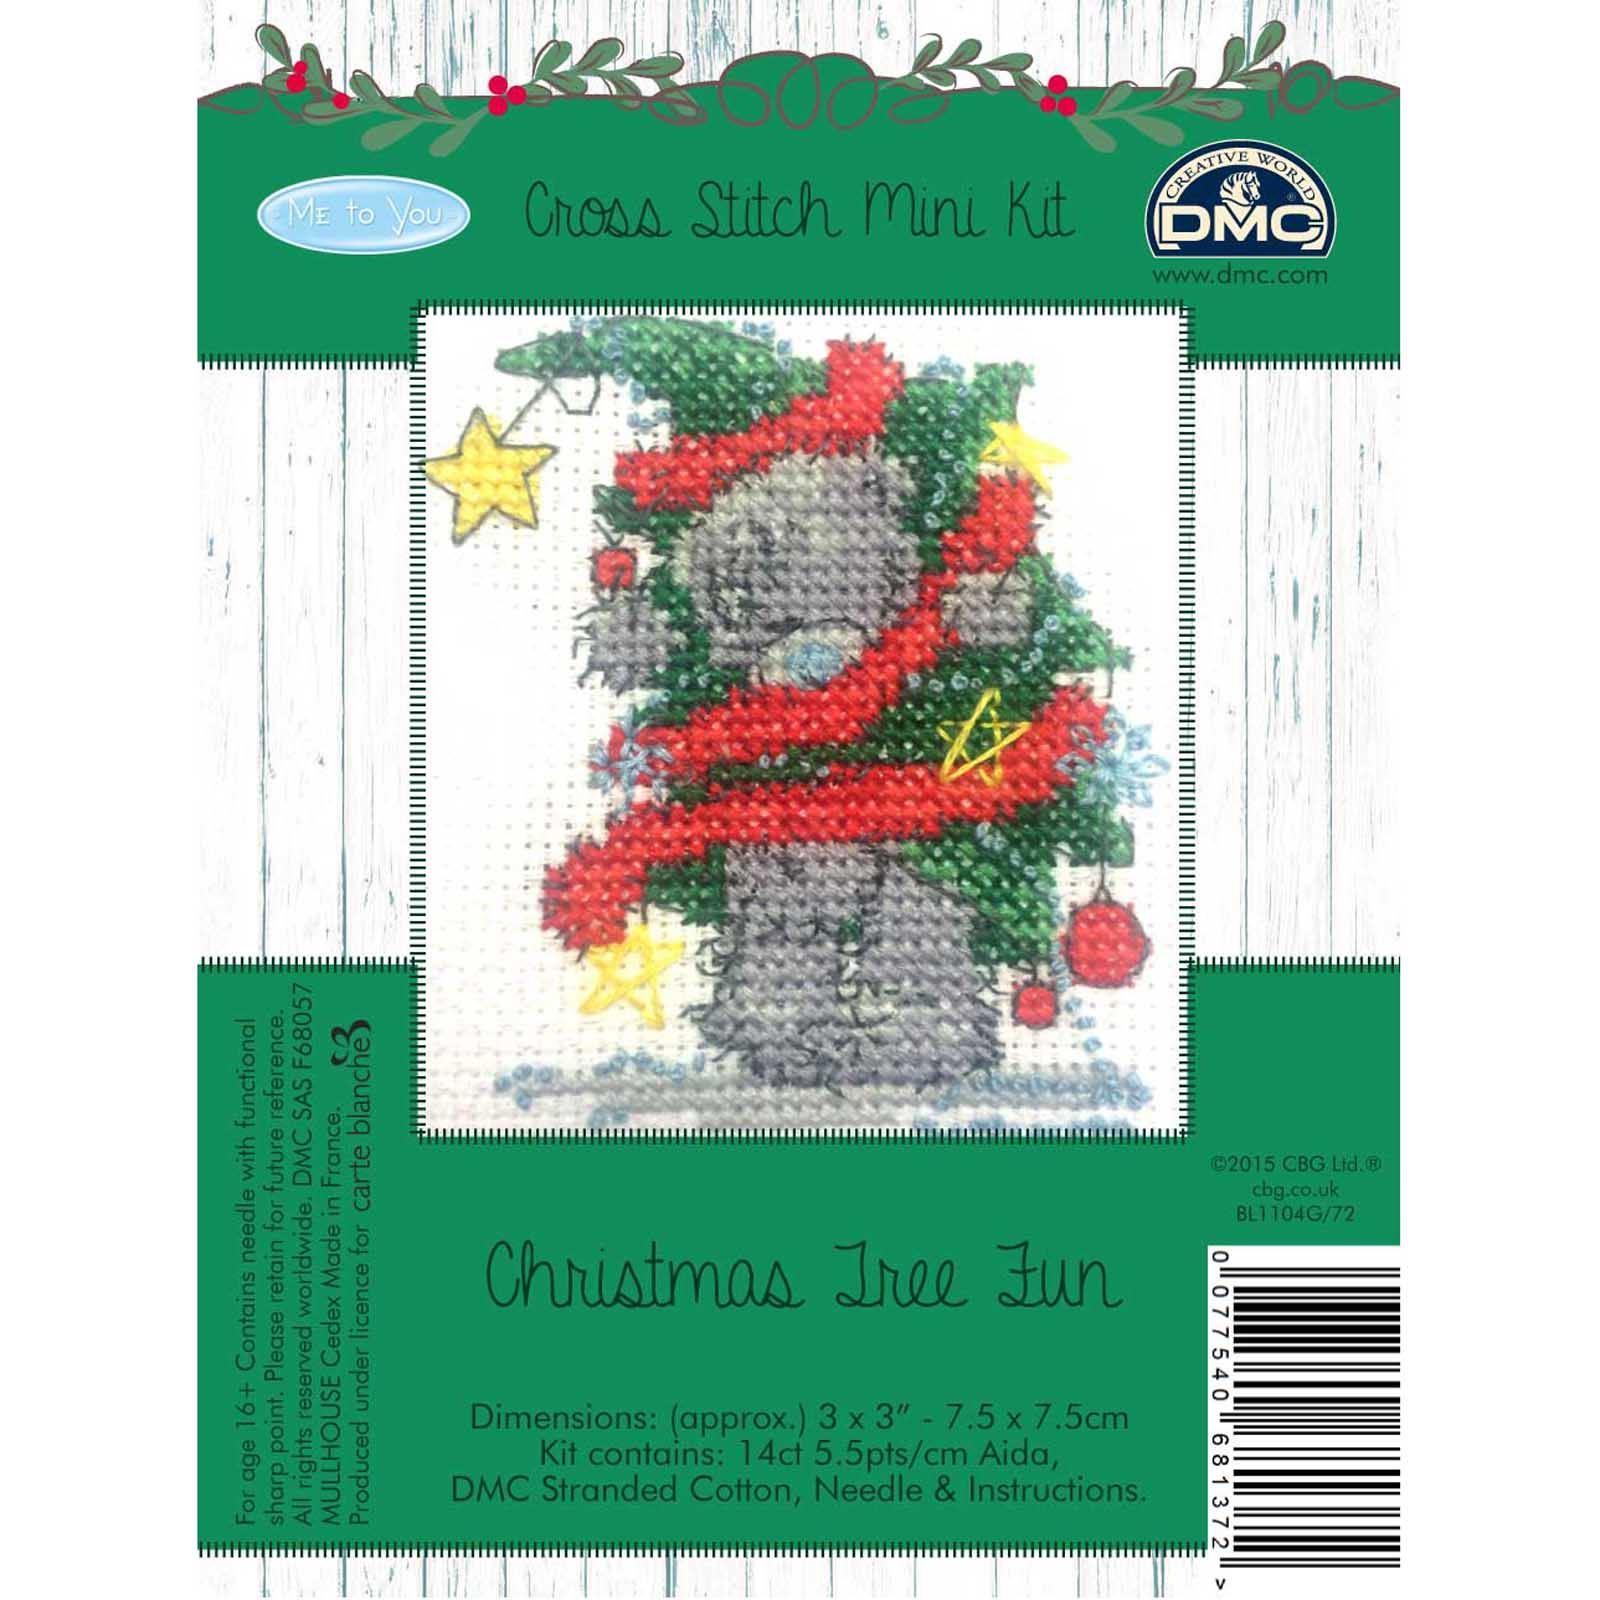 DMC-Me-to-You-Tatty-Teddy-Christmas-Mini-Cross-Stitch-Kits-8-Designs thumbnail 5